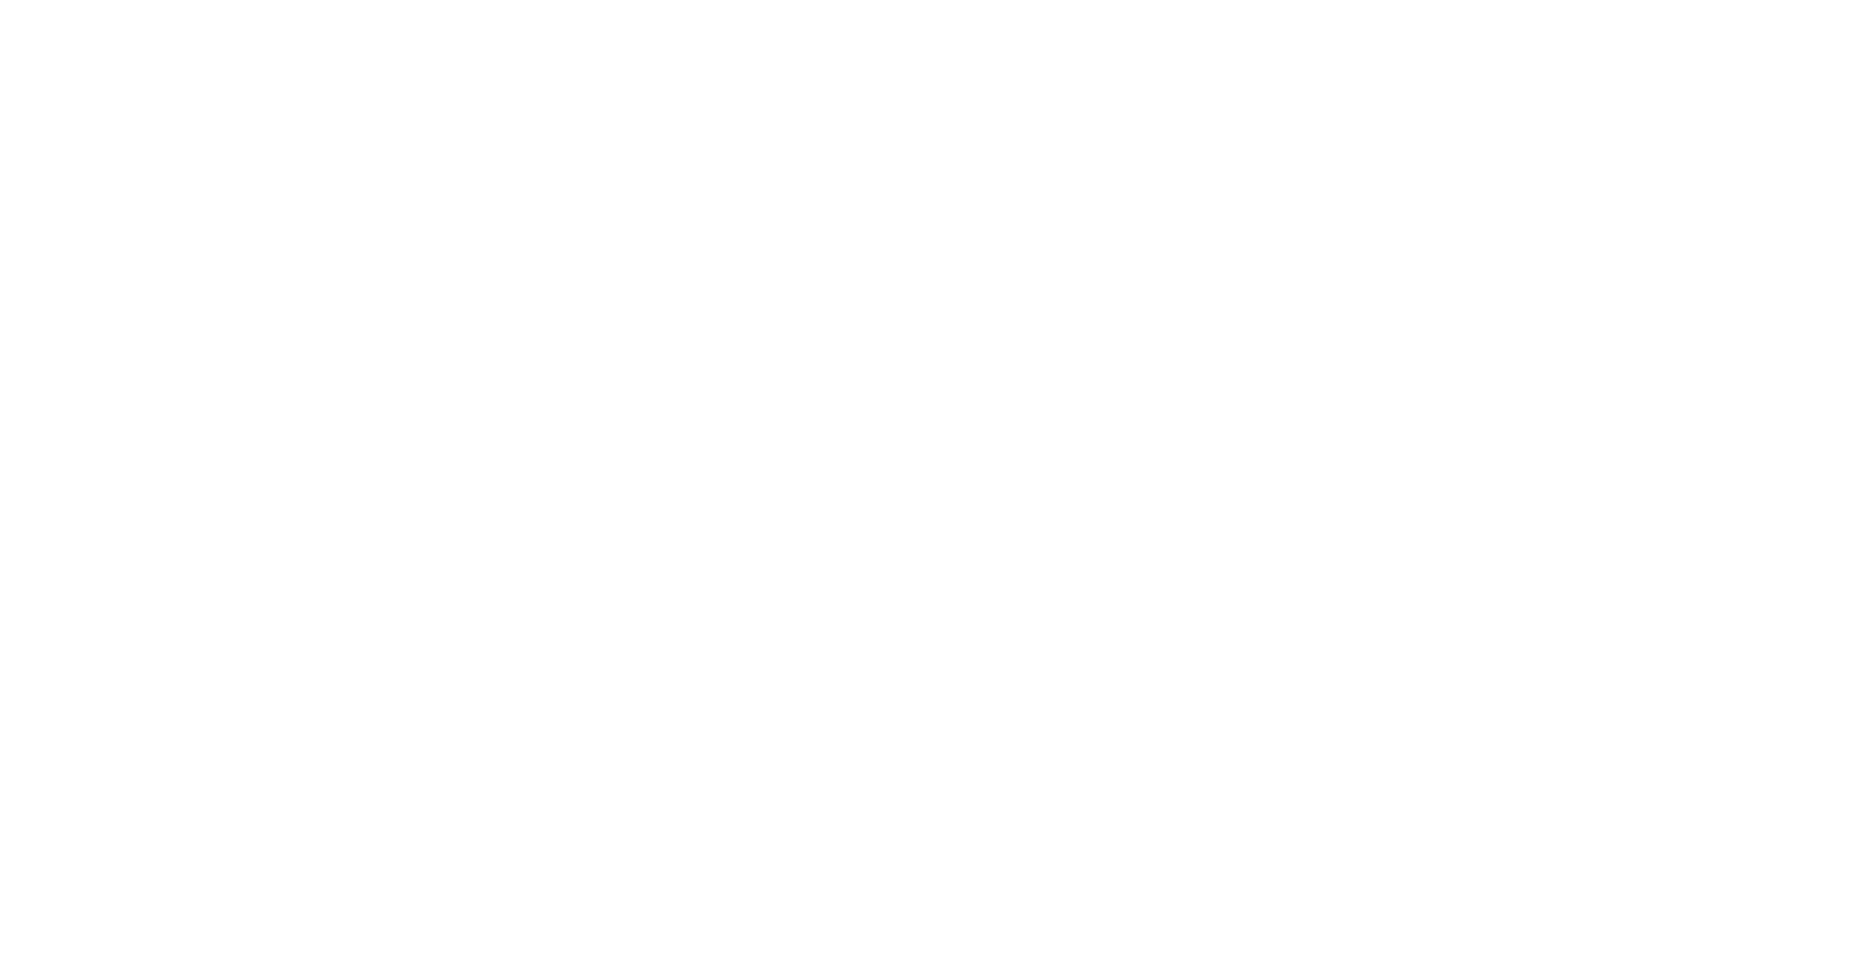 Launching Kimpton's First International Luxury Resort